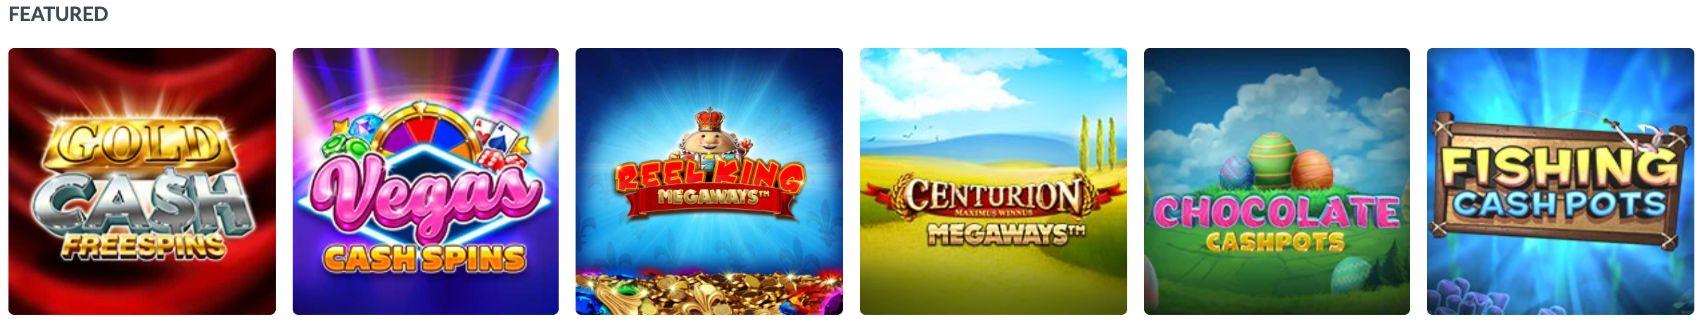 Coral Bingo Featured Slots Games